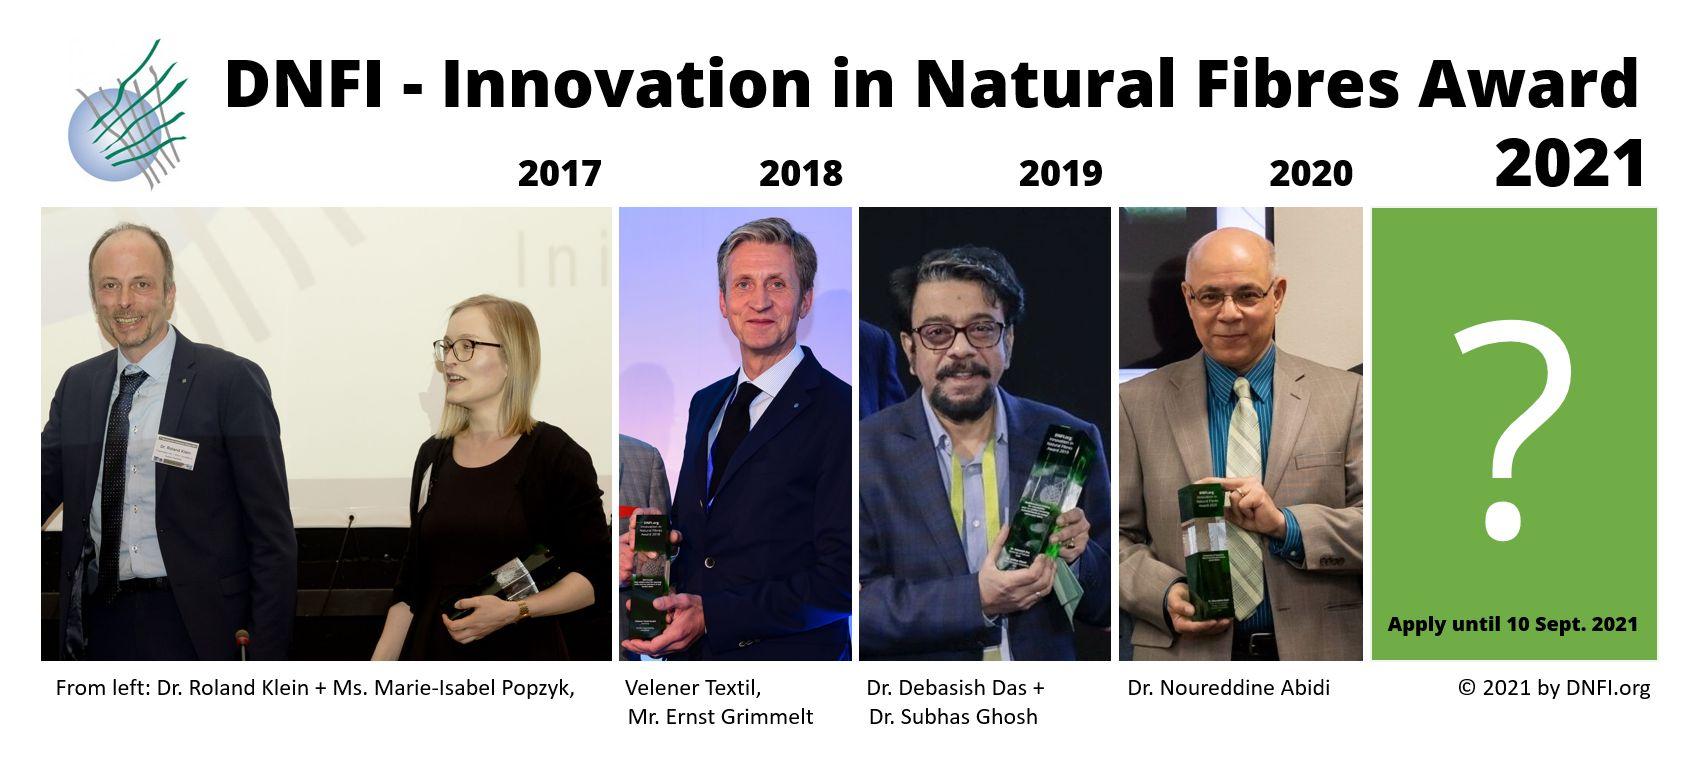 Previous Winners - DNFI Award 20revious W17 - 2020